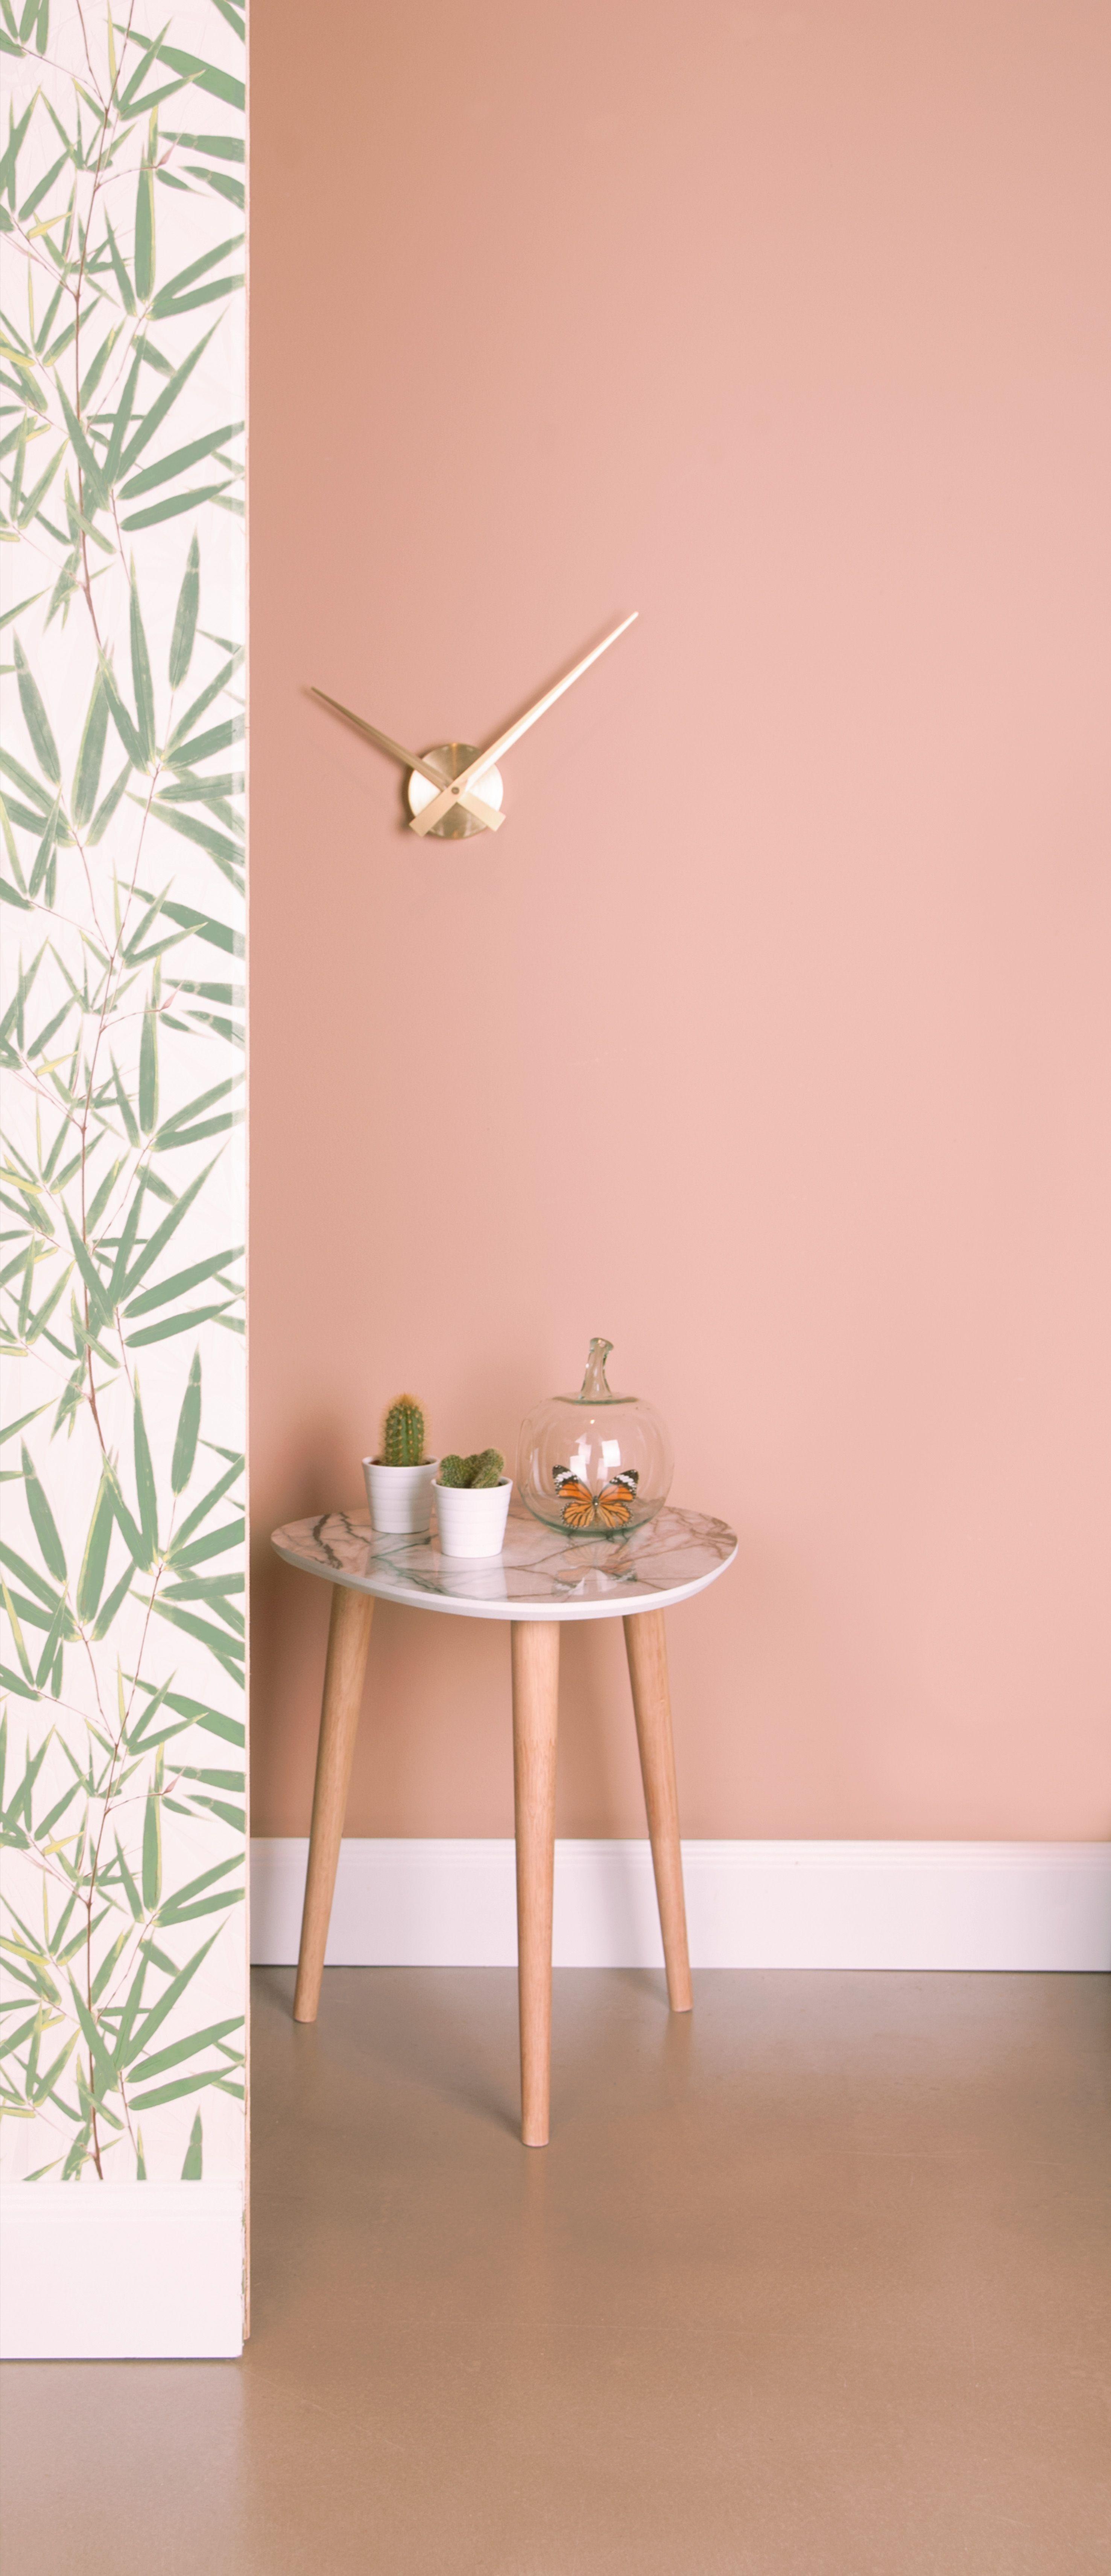 Photo of 9 Unique Peach Bedroom Decorating Ideas dbb538c036ee b160e1f5